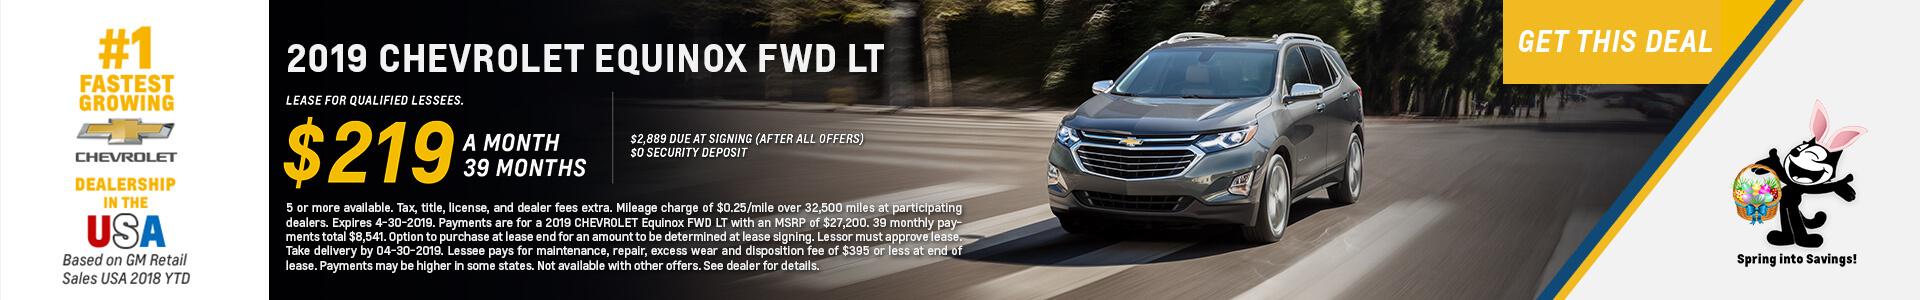 Chevrolet Equinox $219 Lease